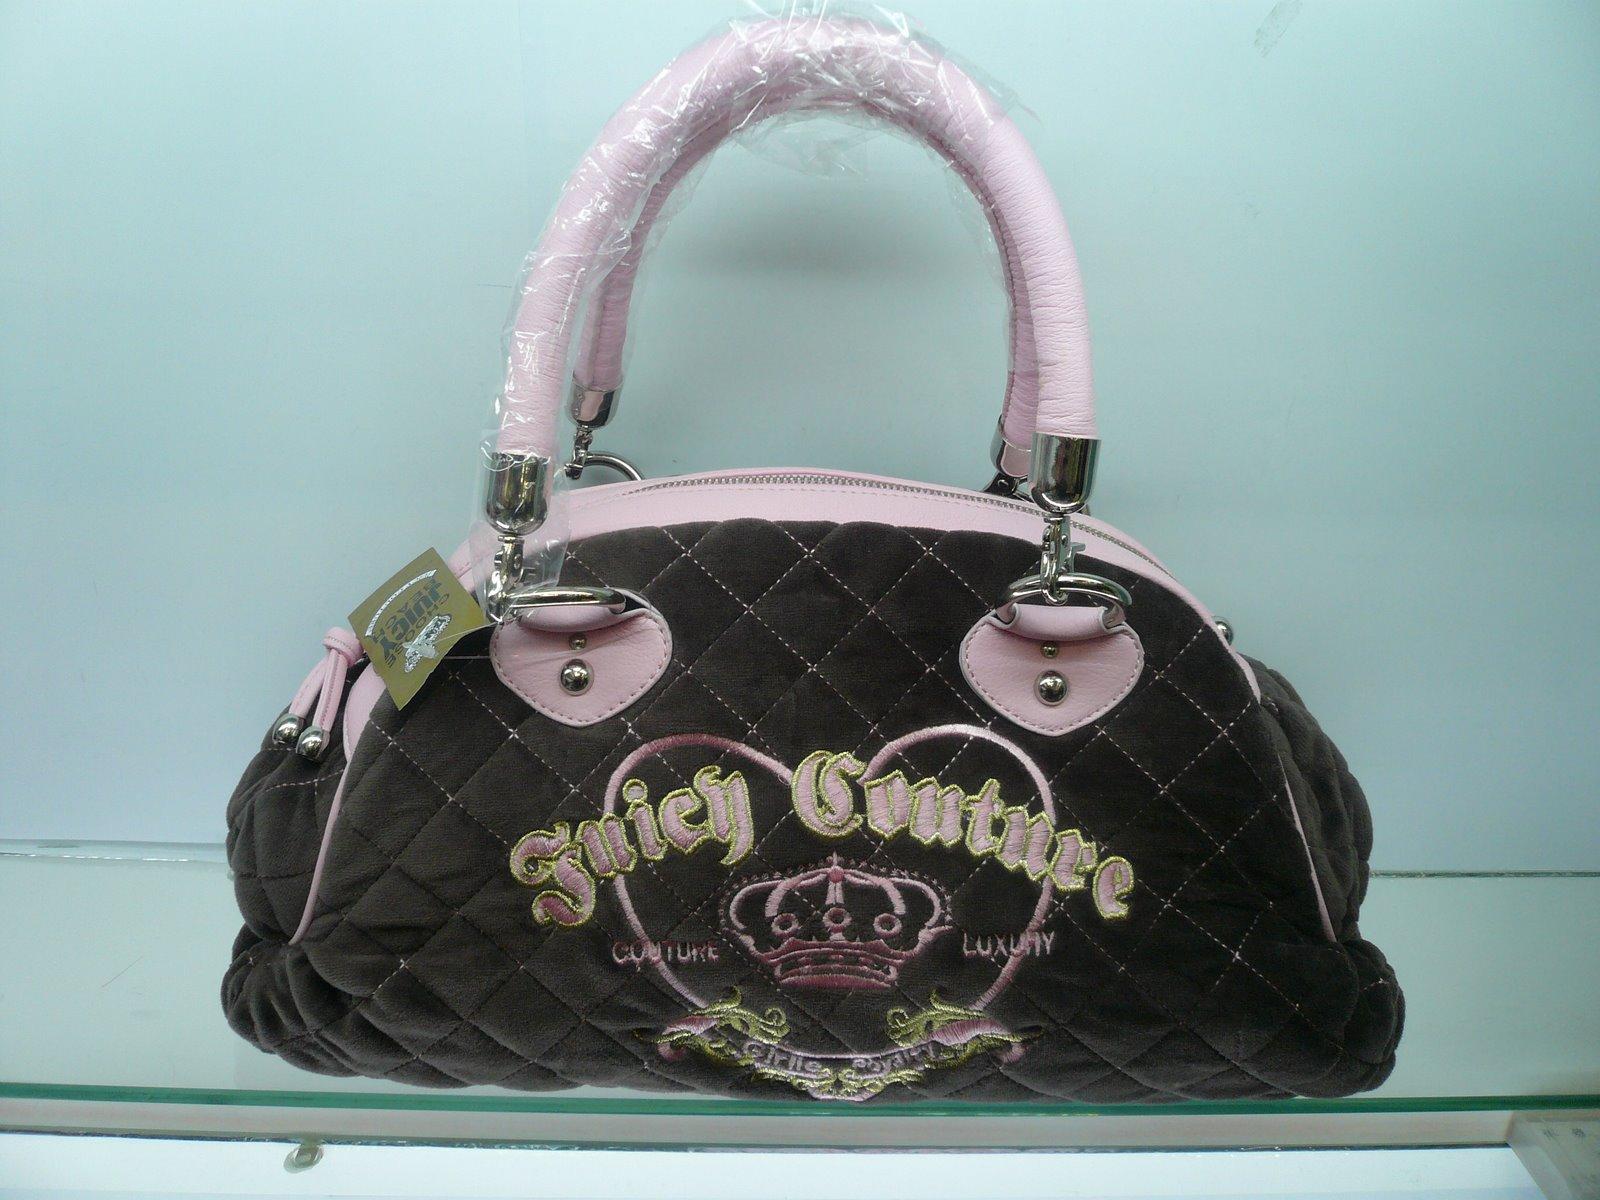 Juicy Couture  120 Bags Women's Tote Purse Handbags